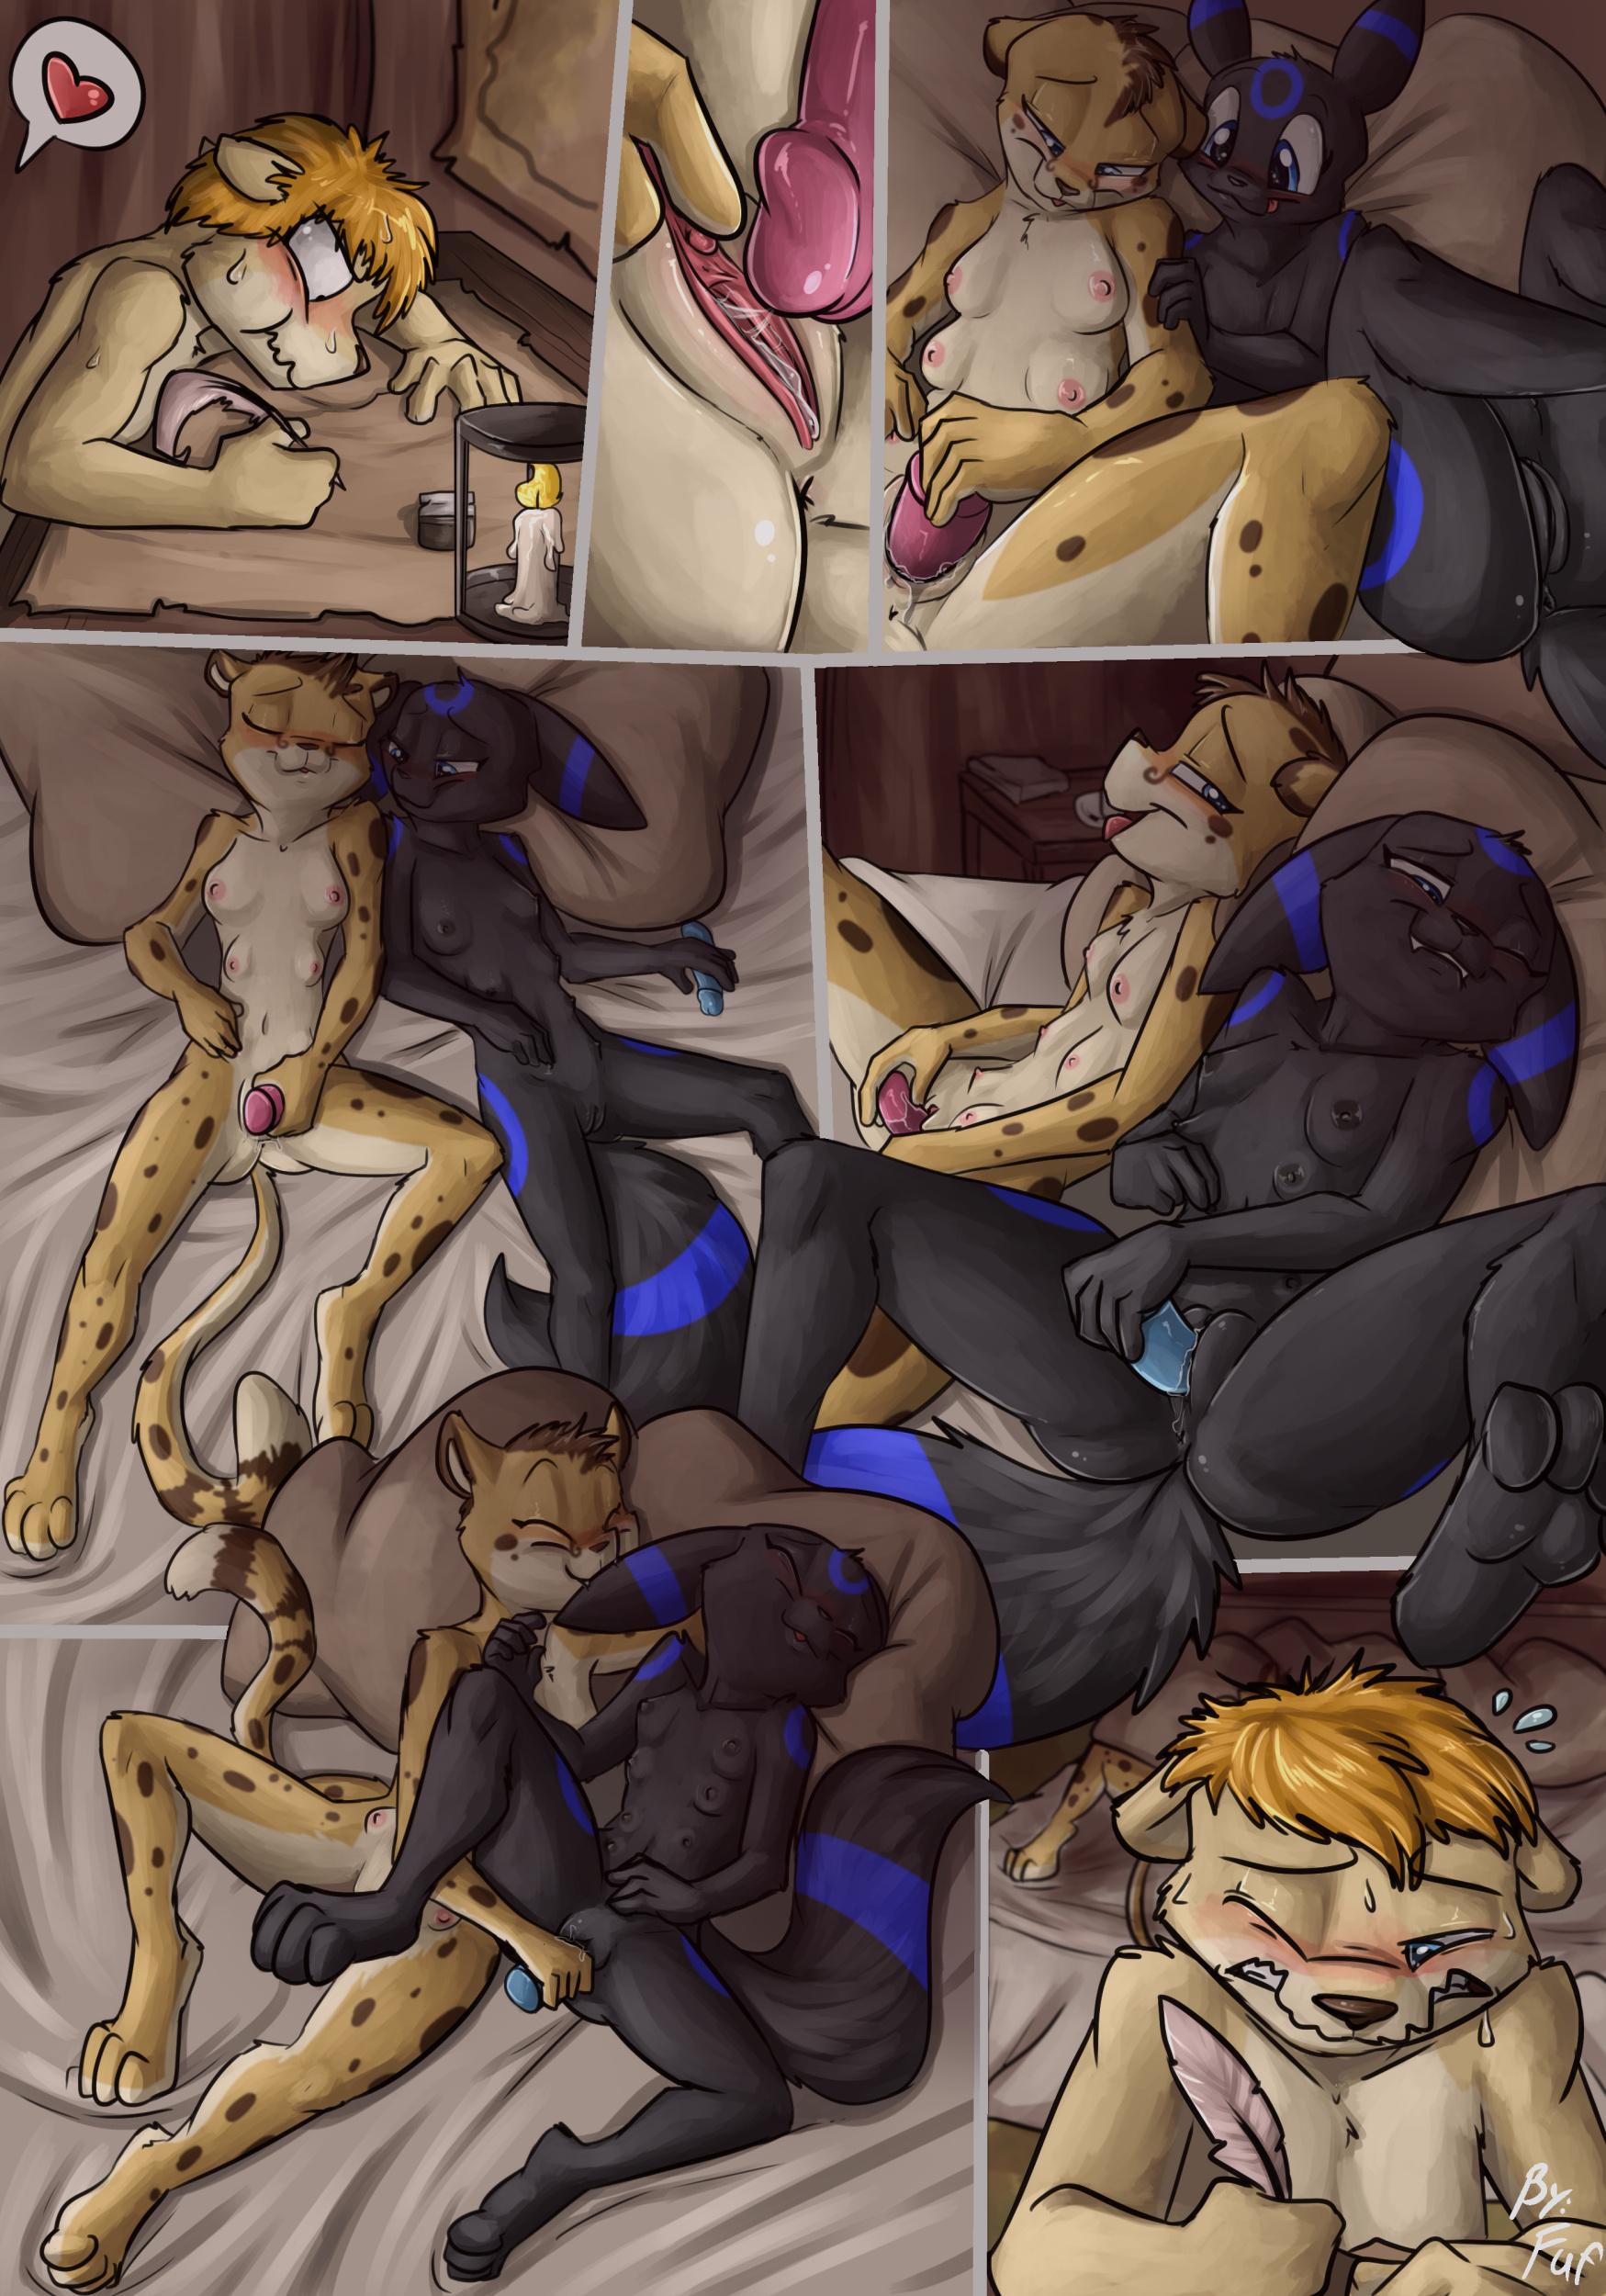 A Small Distraction porn comics Masturbation, Blowjob, Cum Shots, cunnilingus, fingering, Furry, Group Sex, Lesbians, Sex Toys, Straight, Threesome